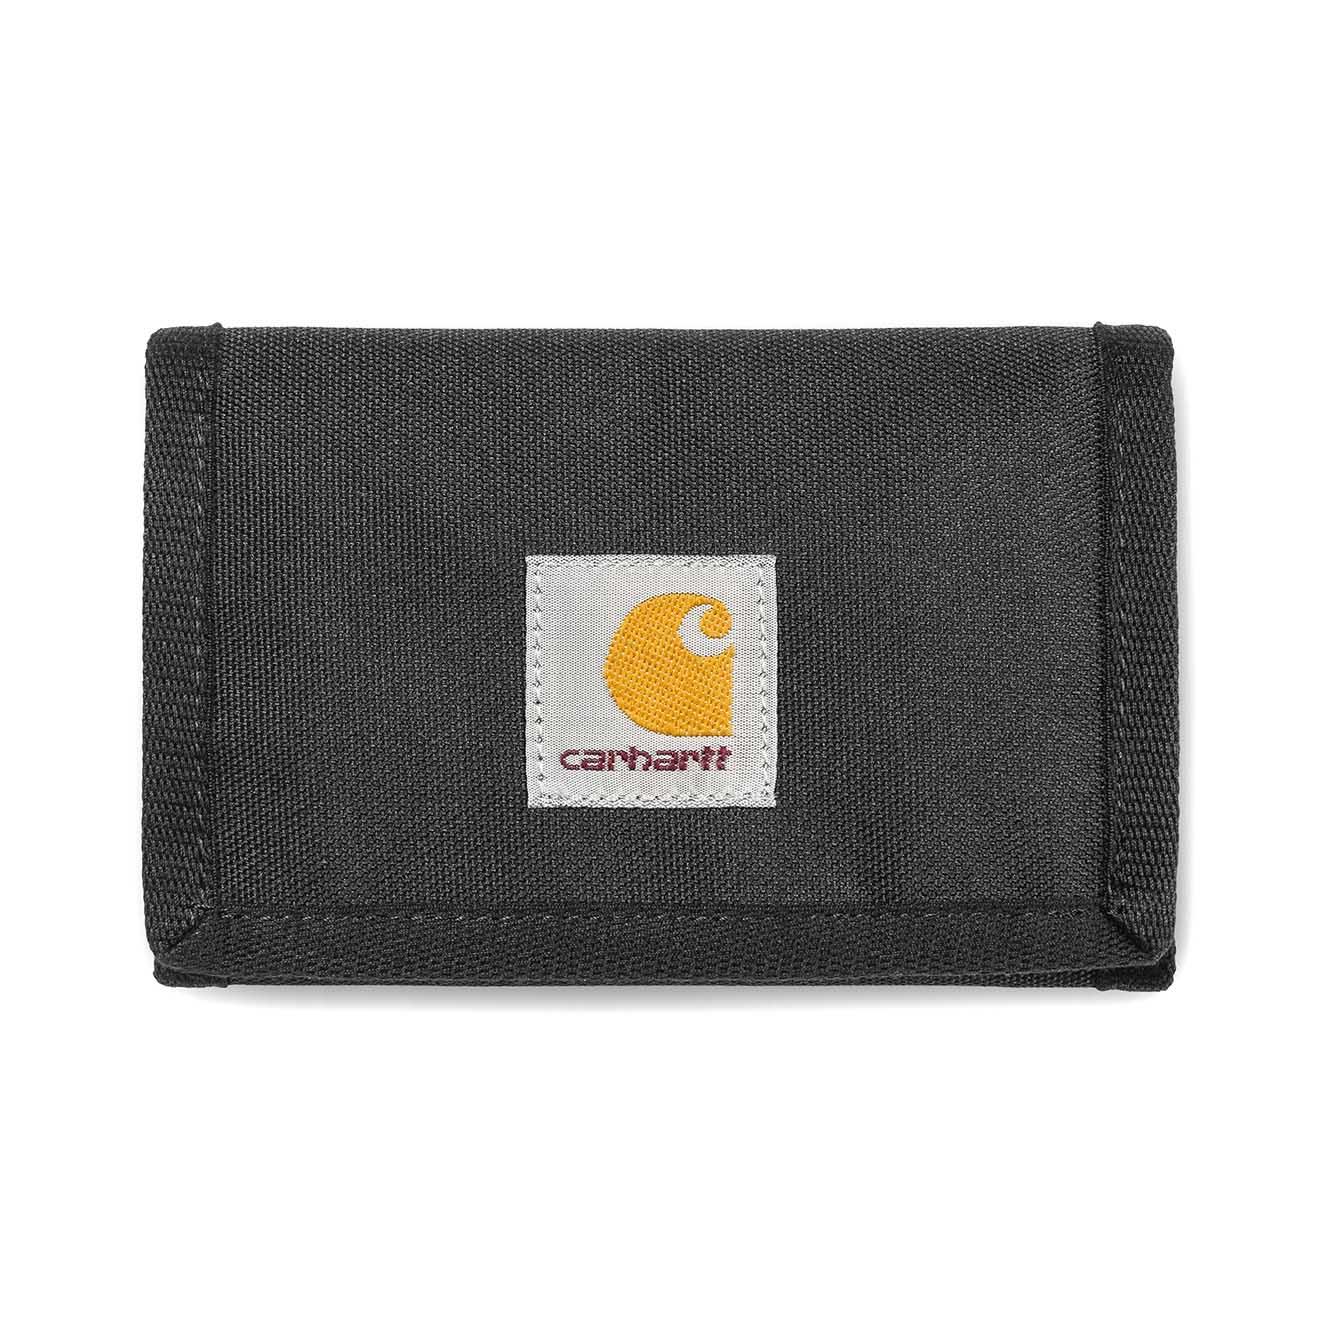 carhartt watch wallet cypress black black